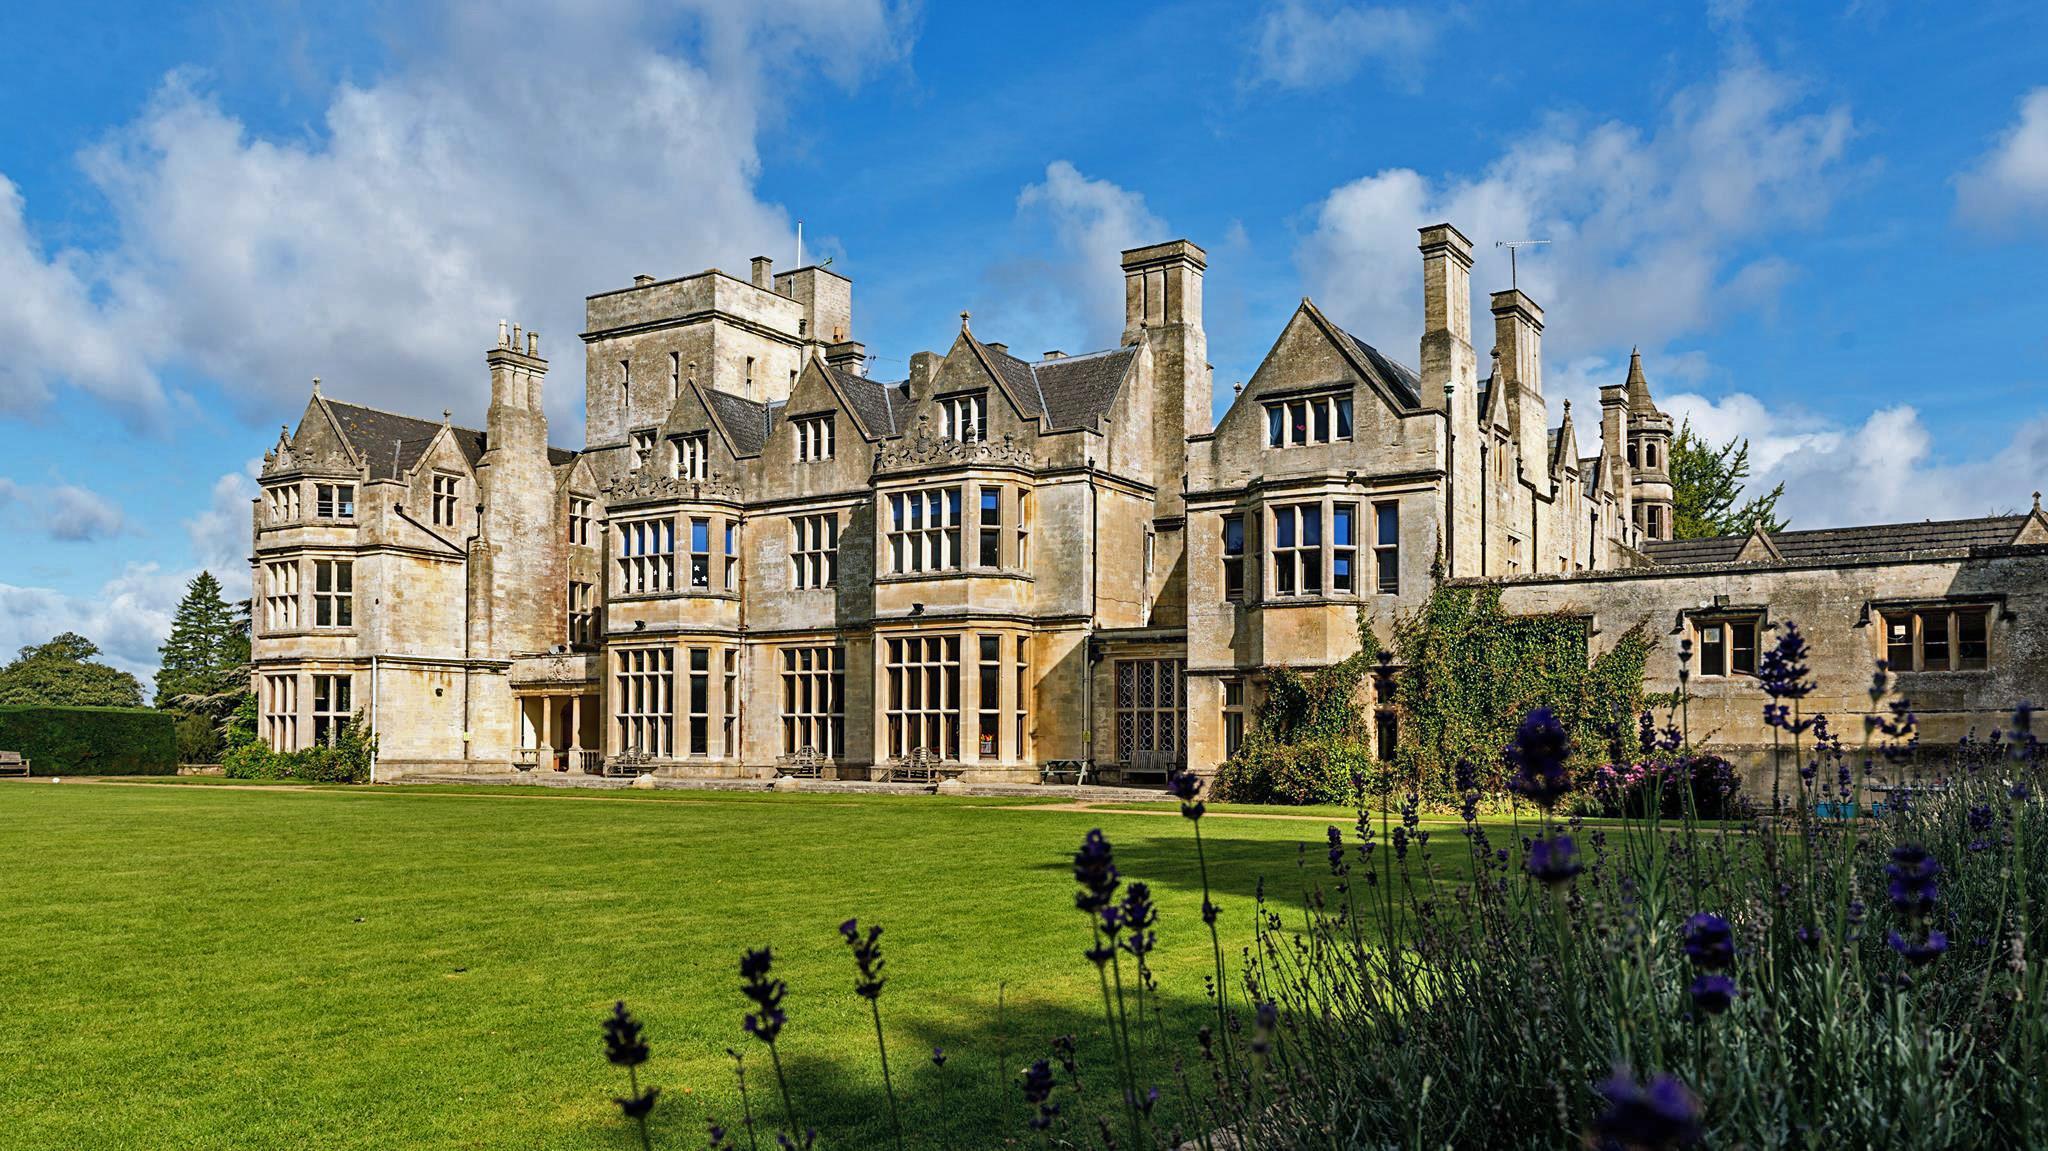 Hatherop Castle School